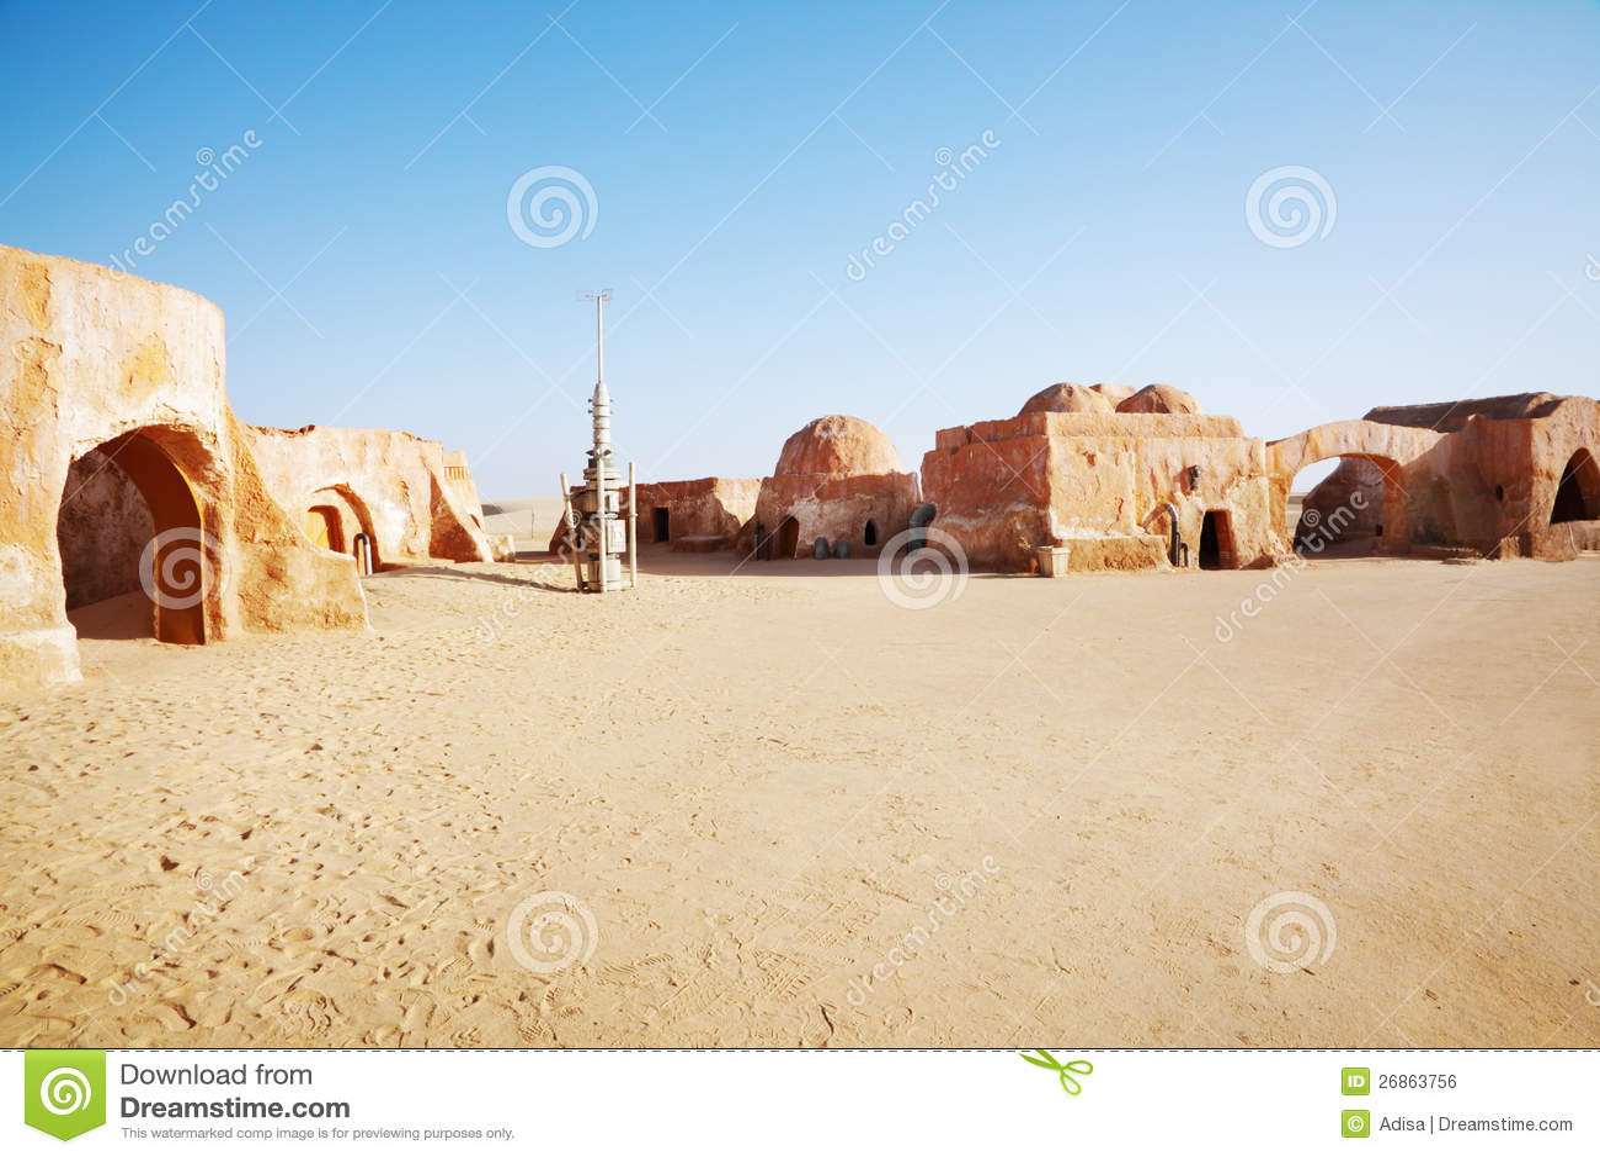 Star Wars Decoration In Sahara Desert Stock Photo